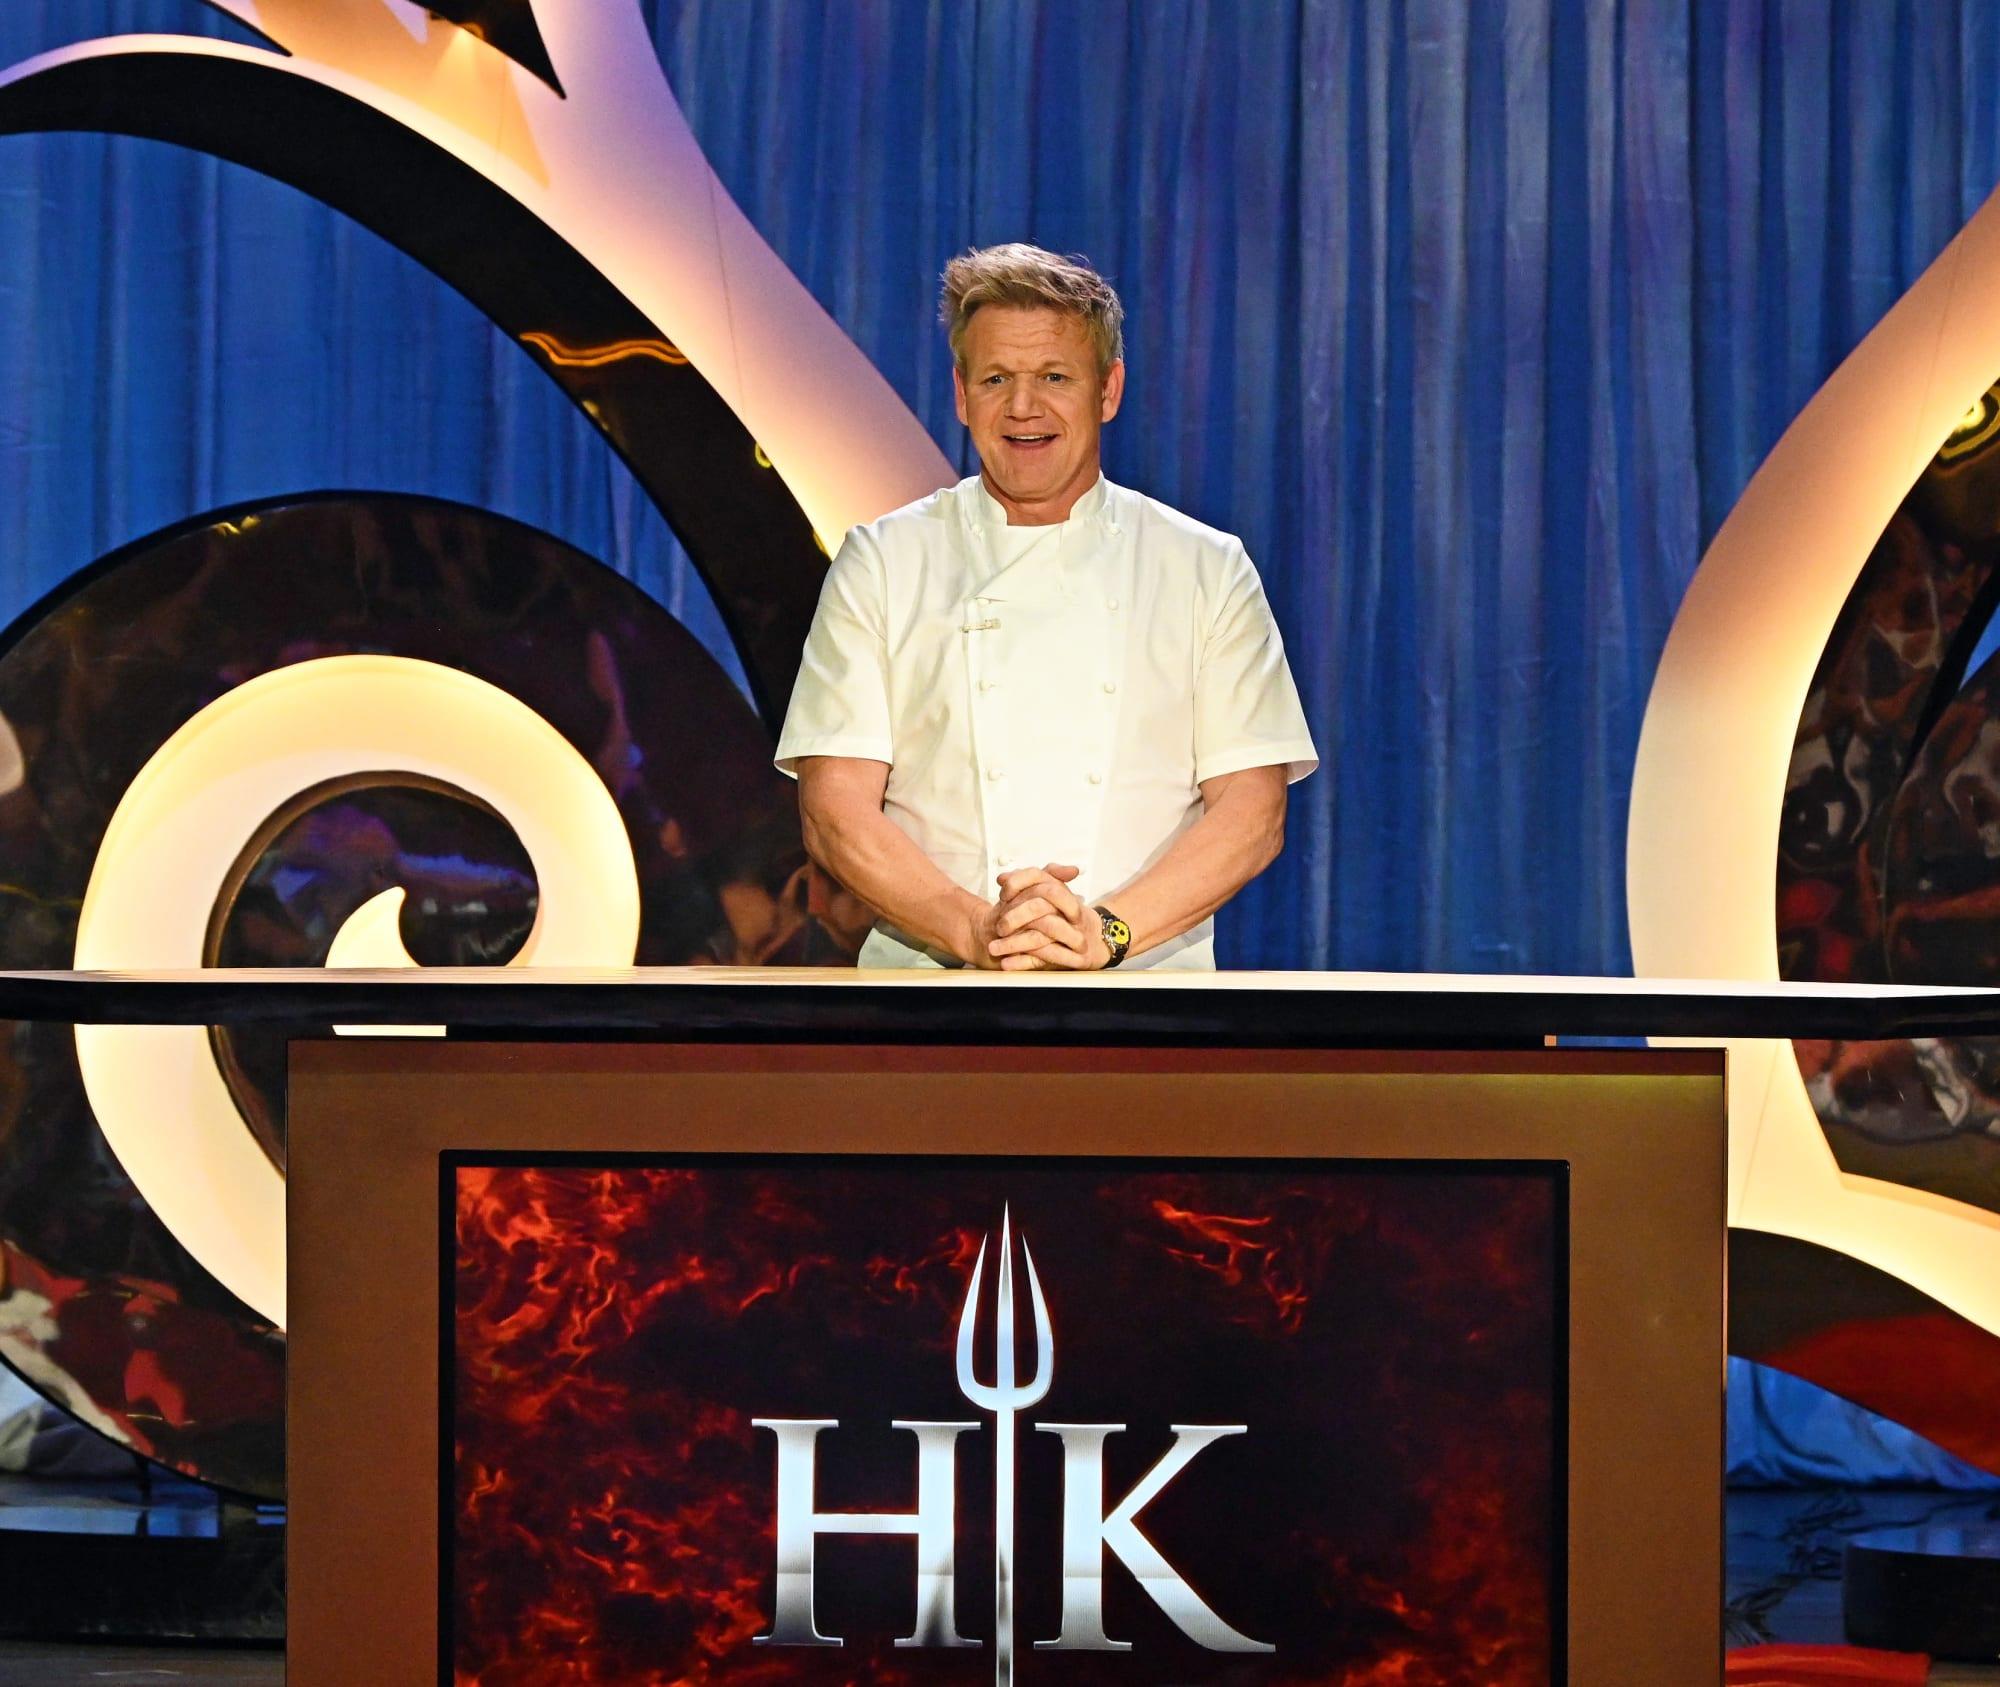 Gordon Ramsay: Indoor dining returns at his restaurants next week